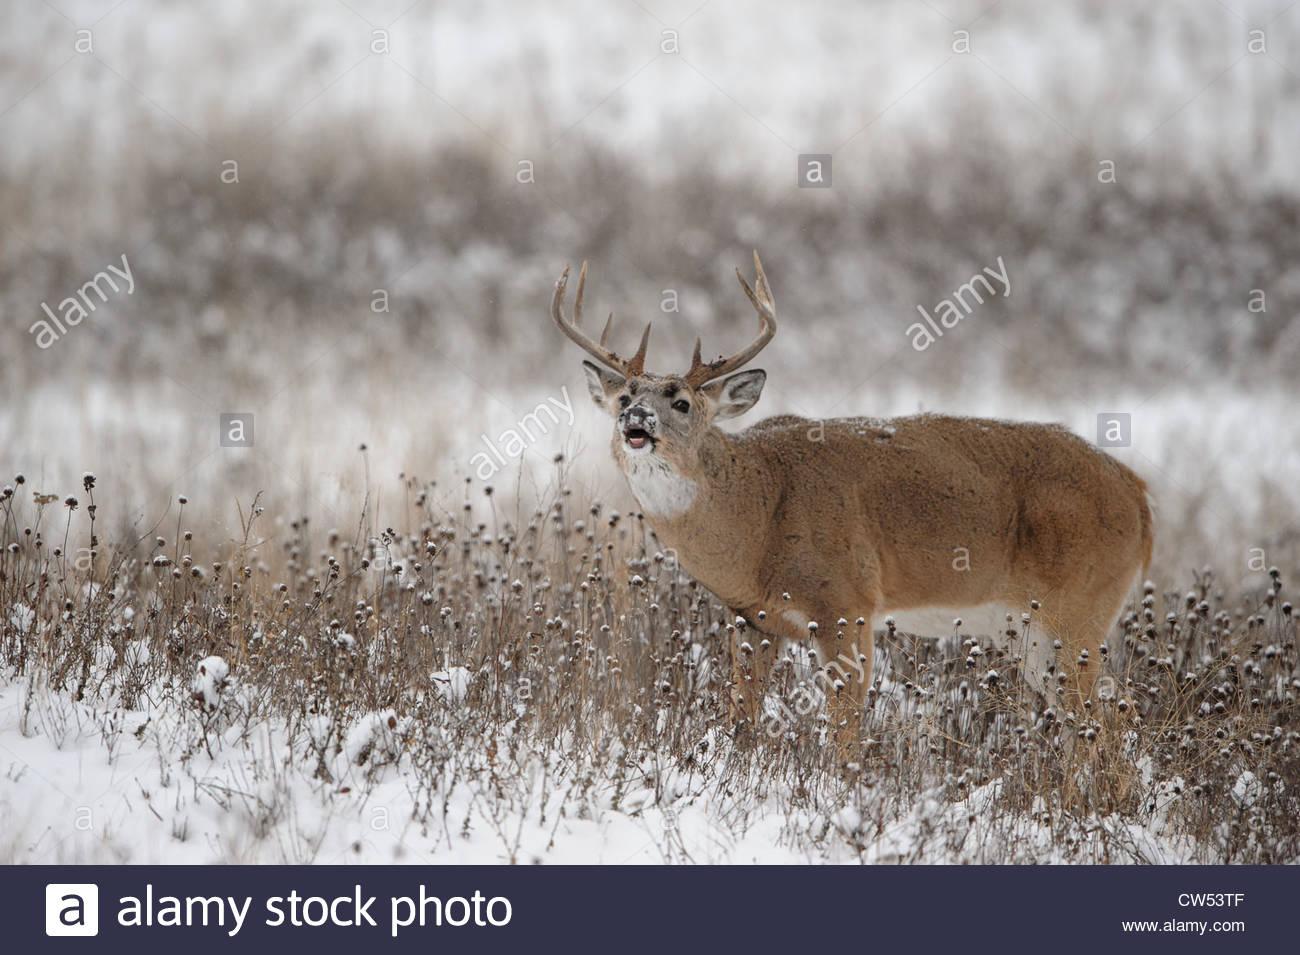 Whitetail Deer Snow Stock Photos & Whitetail Deer Snow